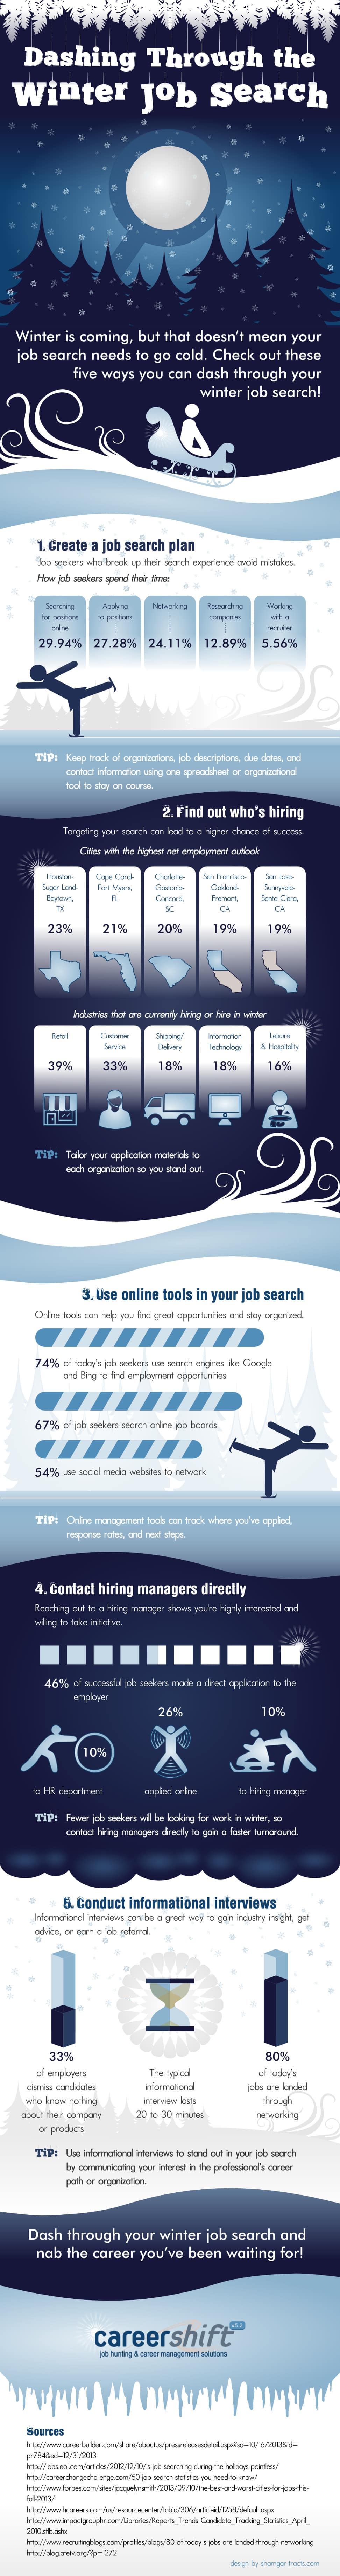 winter job search